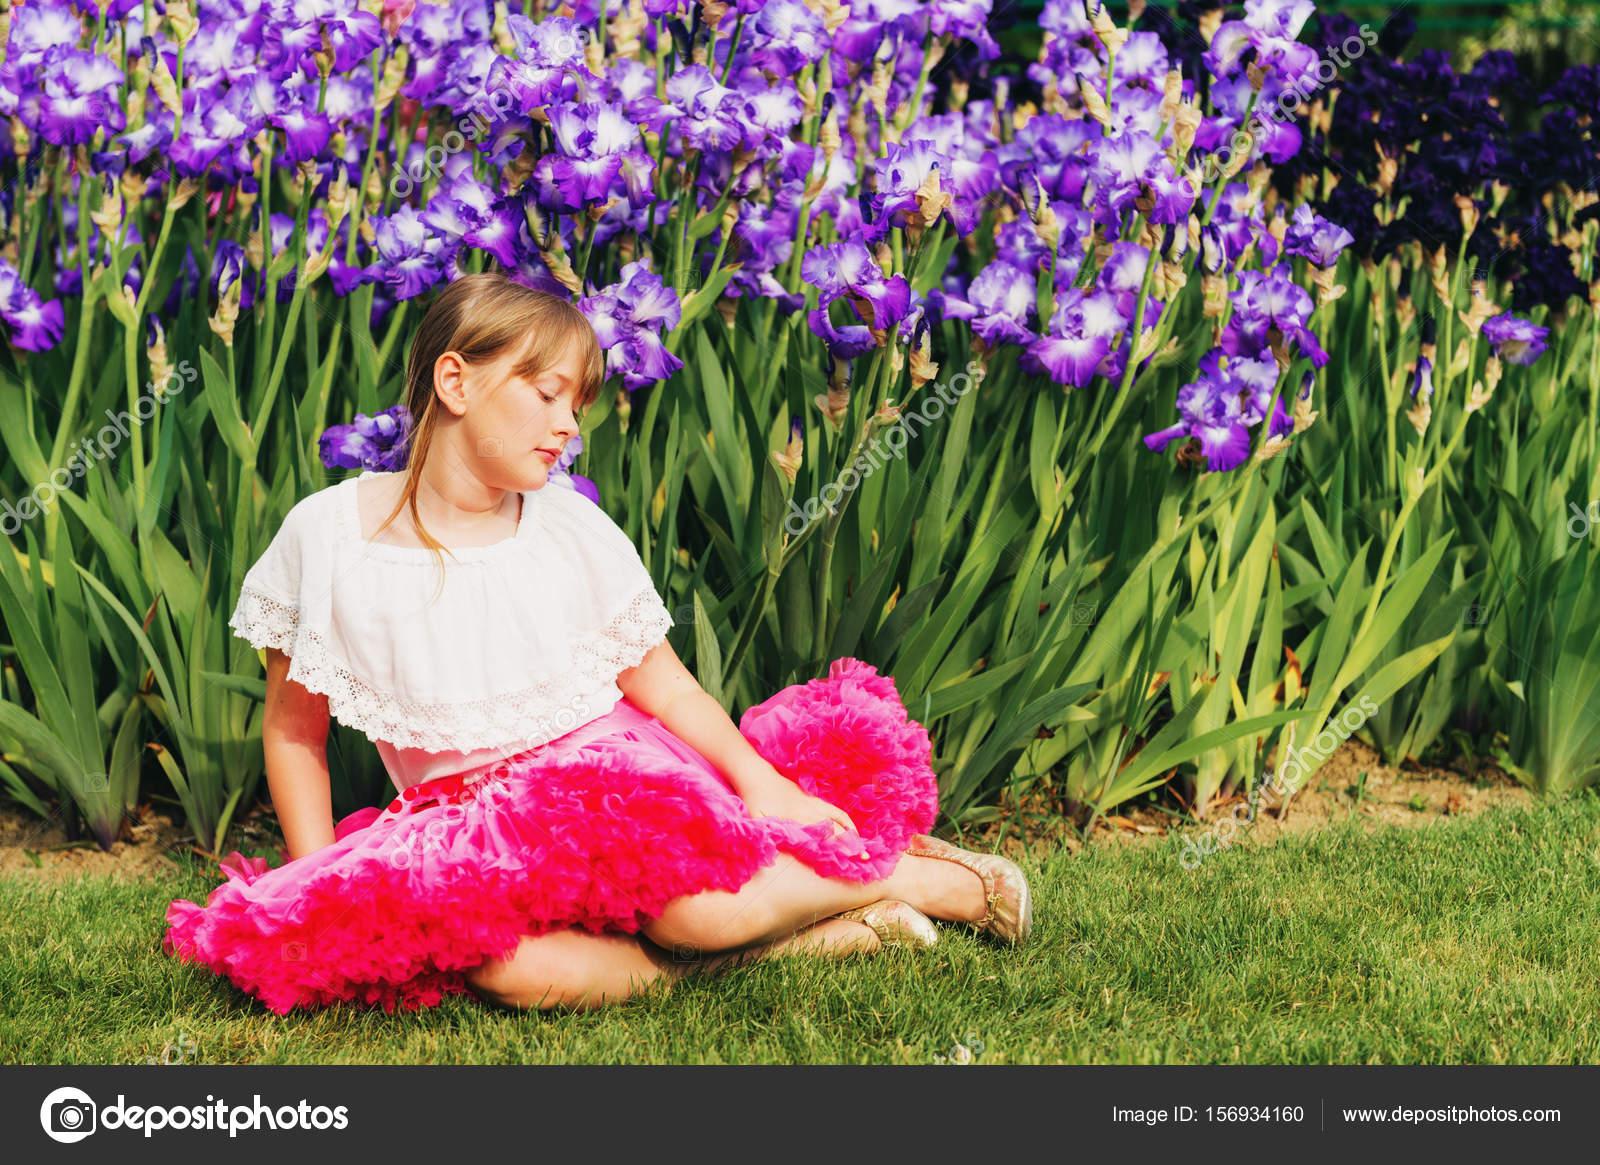 Cute little girl playing in iris flower garden on a nice summer day cute little girl playing in iris flower garden on a nice summer day wearing white izmirmasajfo Gallery